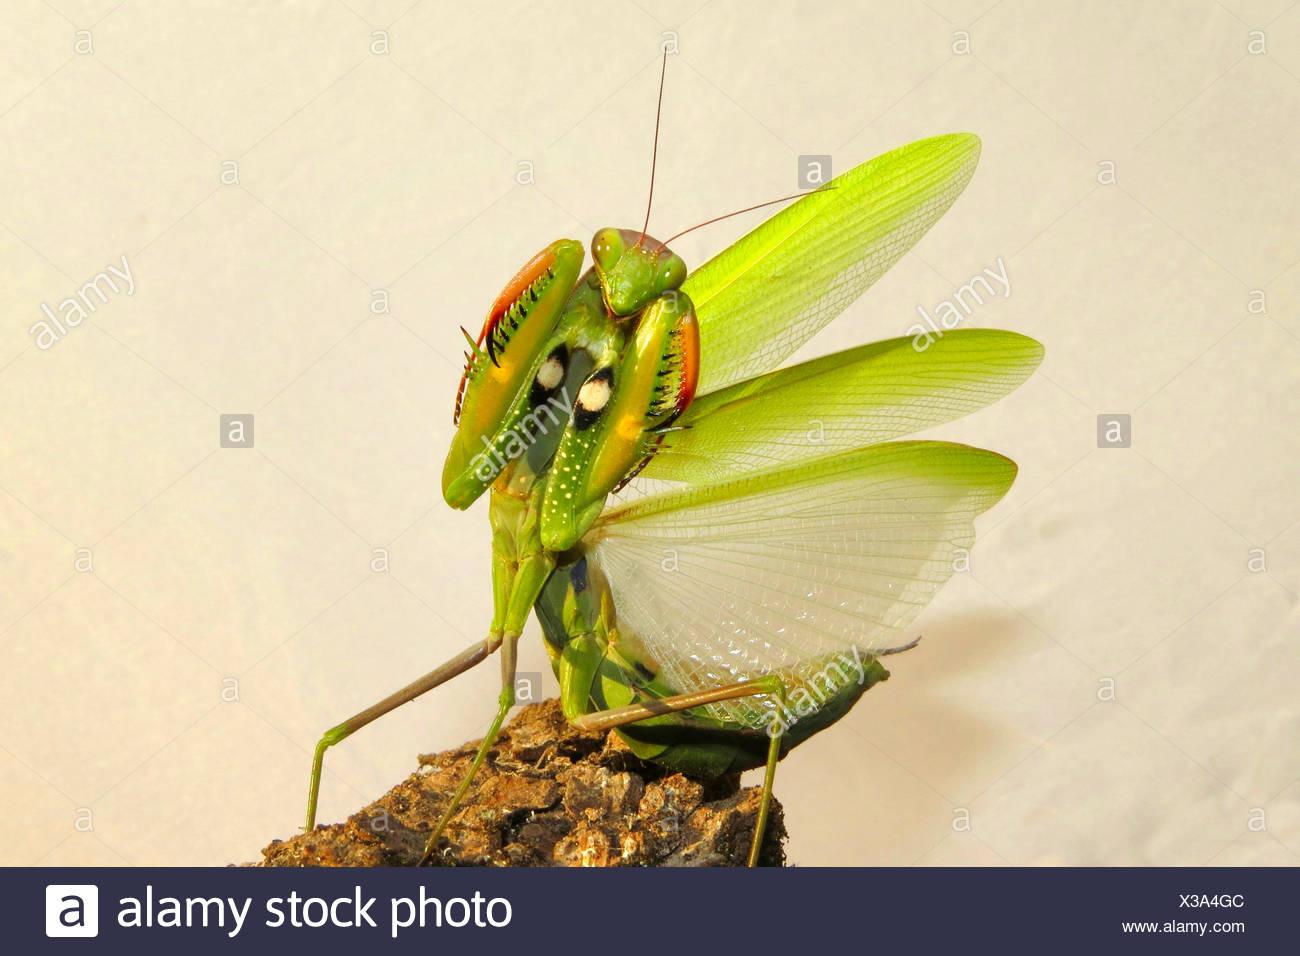 Europaeische Gottesanbeterin (Mantis religiosa), in Drohgebaerde, Spanien | European preying mantis (Mantis religiosa),  threate - Stock Image